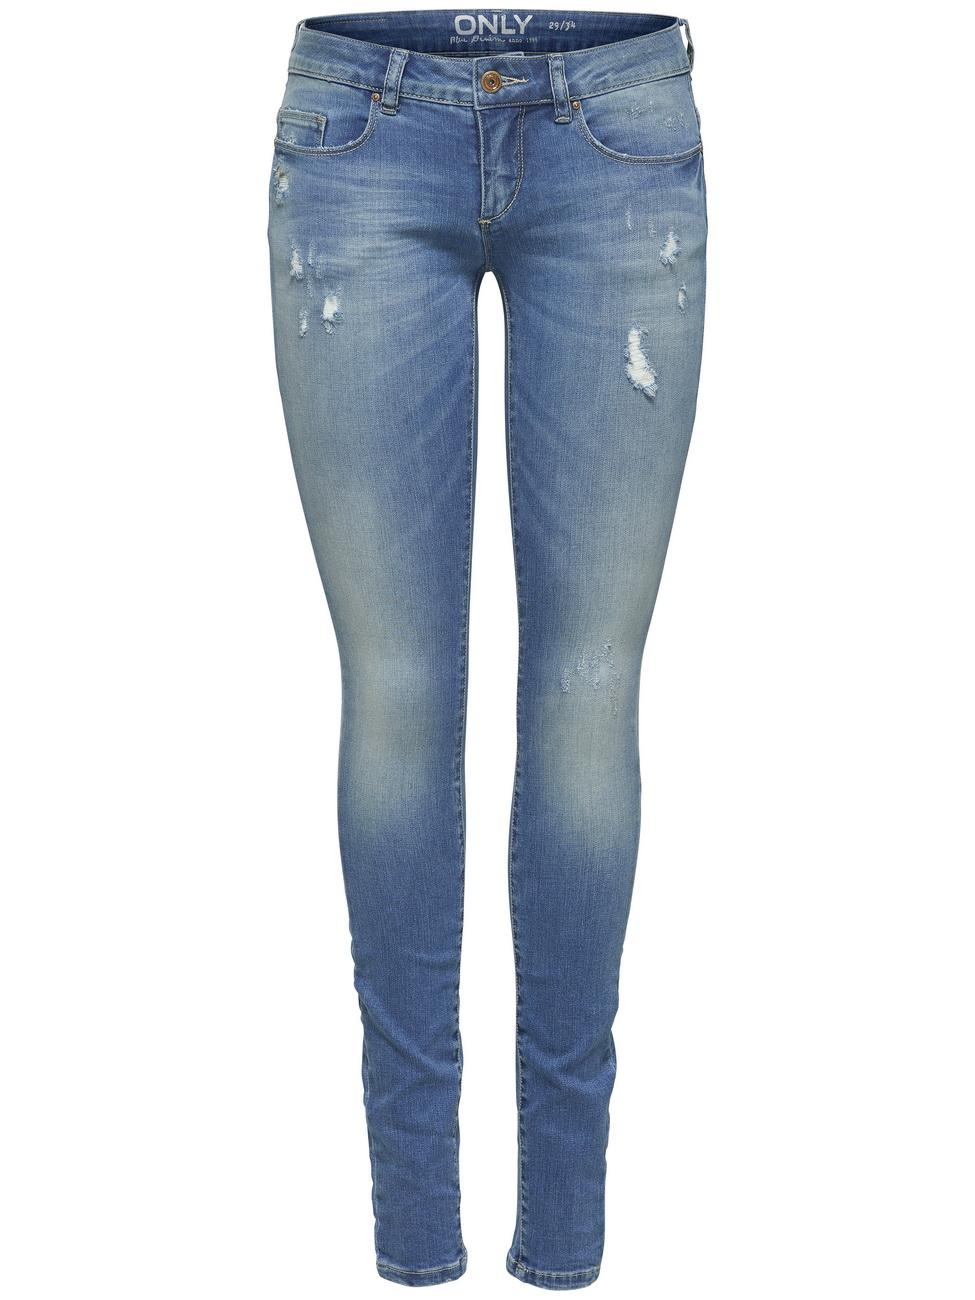 3366b164aa81 Only Damen Jeans onlCORAL SL SK DNM JEANS BJ8191 - Skinny Fit - Blau -  Medium Blue